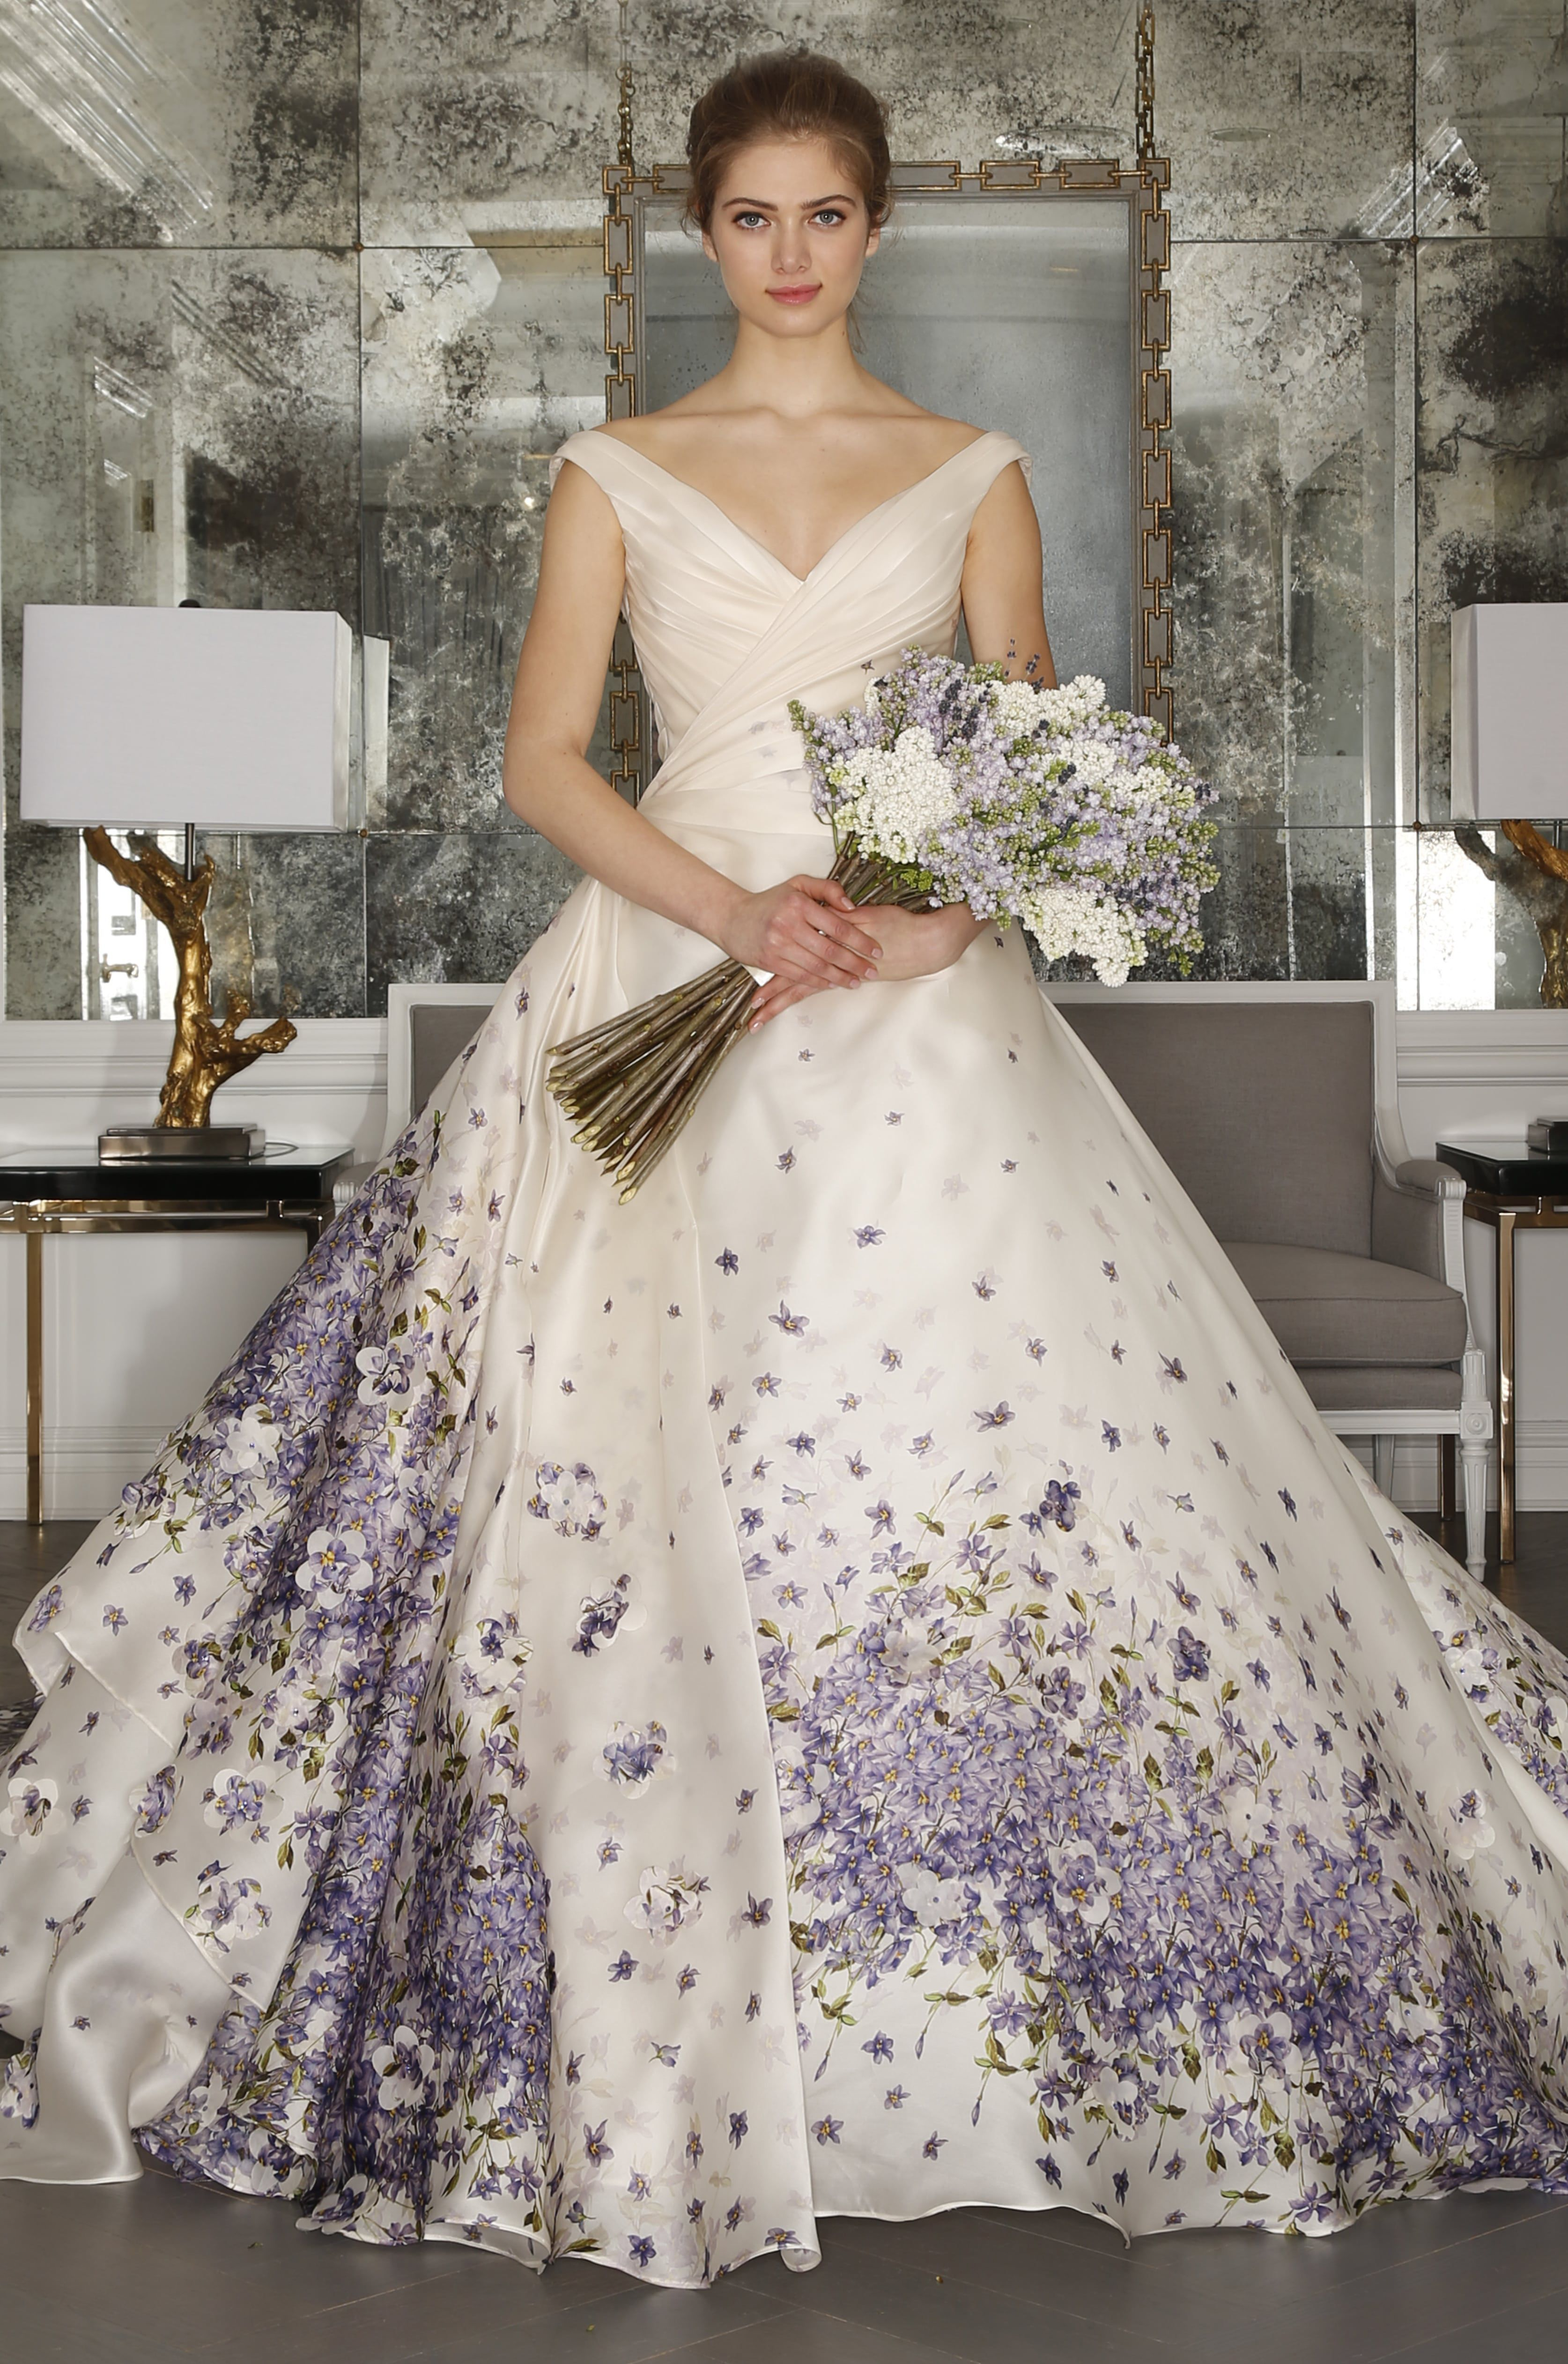 Cheap rustic wedding dresses  Romona Keveza Collection Bridal   Rustic wedding chic Bridal